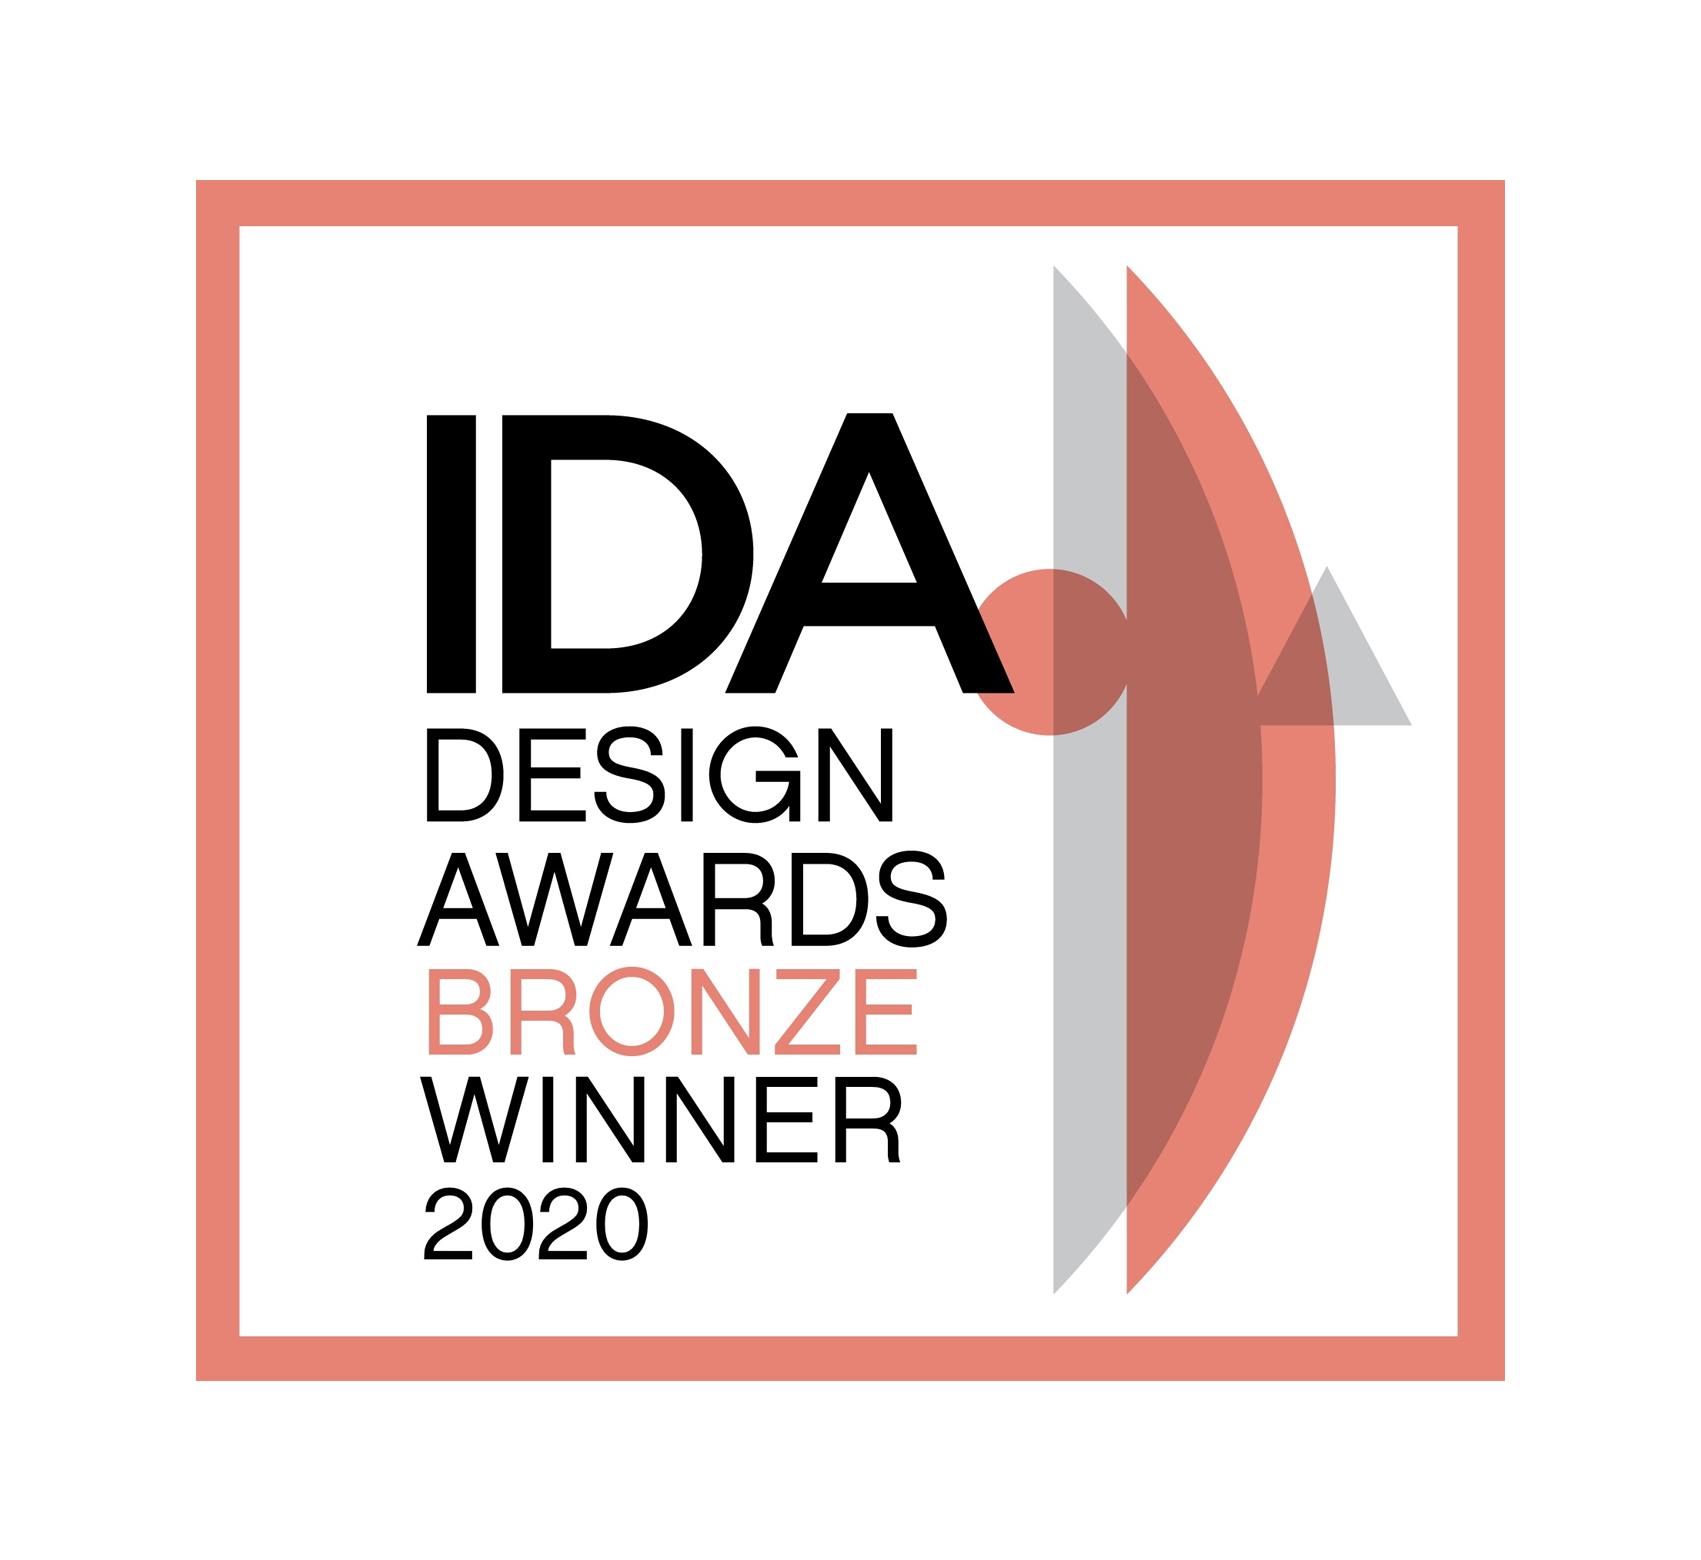 IDA Design Awards BRONZE Winner 2020